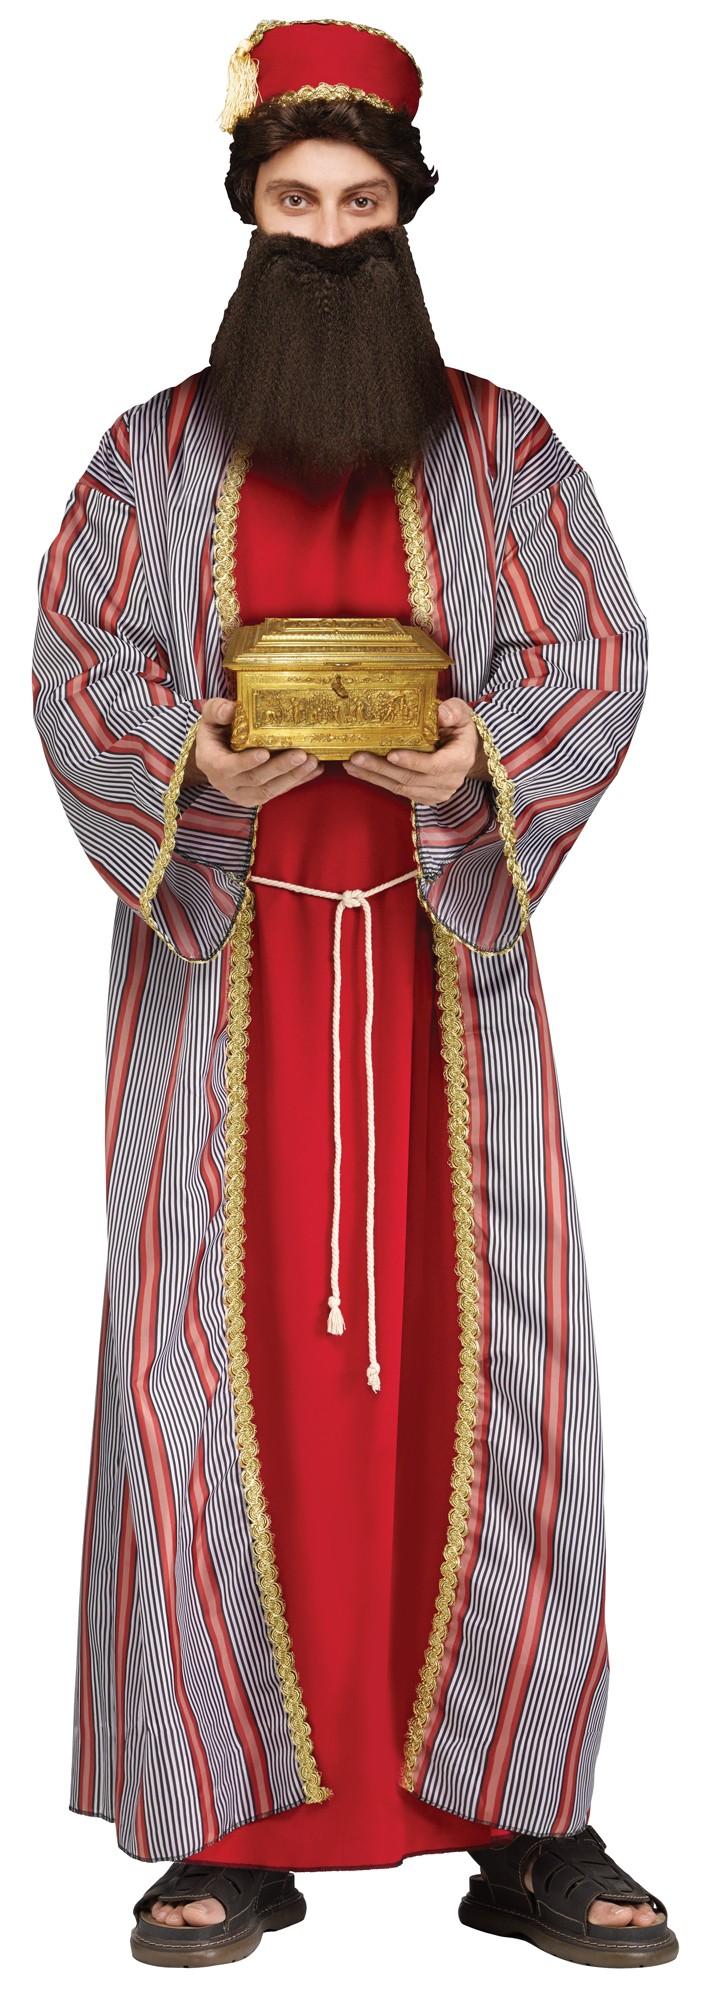 3 wise men adults fancy dress christmas nativity king shepherd sentinel 3 wise men adults fancy dress christmas nativity king shepherd costume outfits solutioingenieria Images